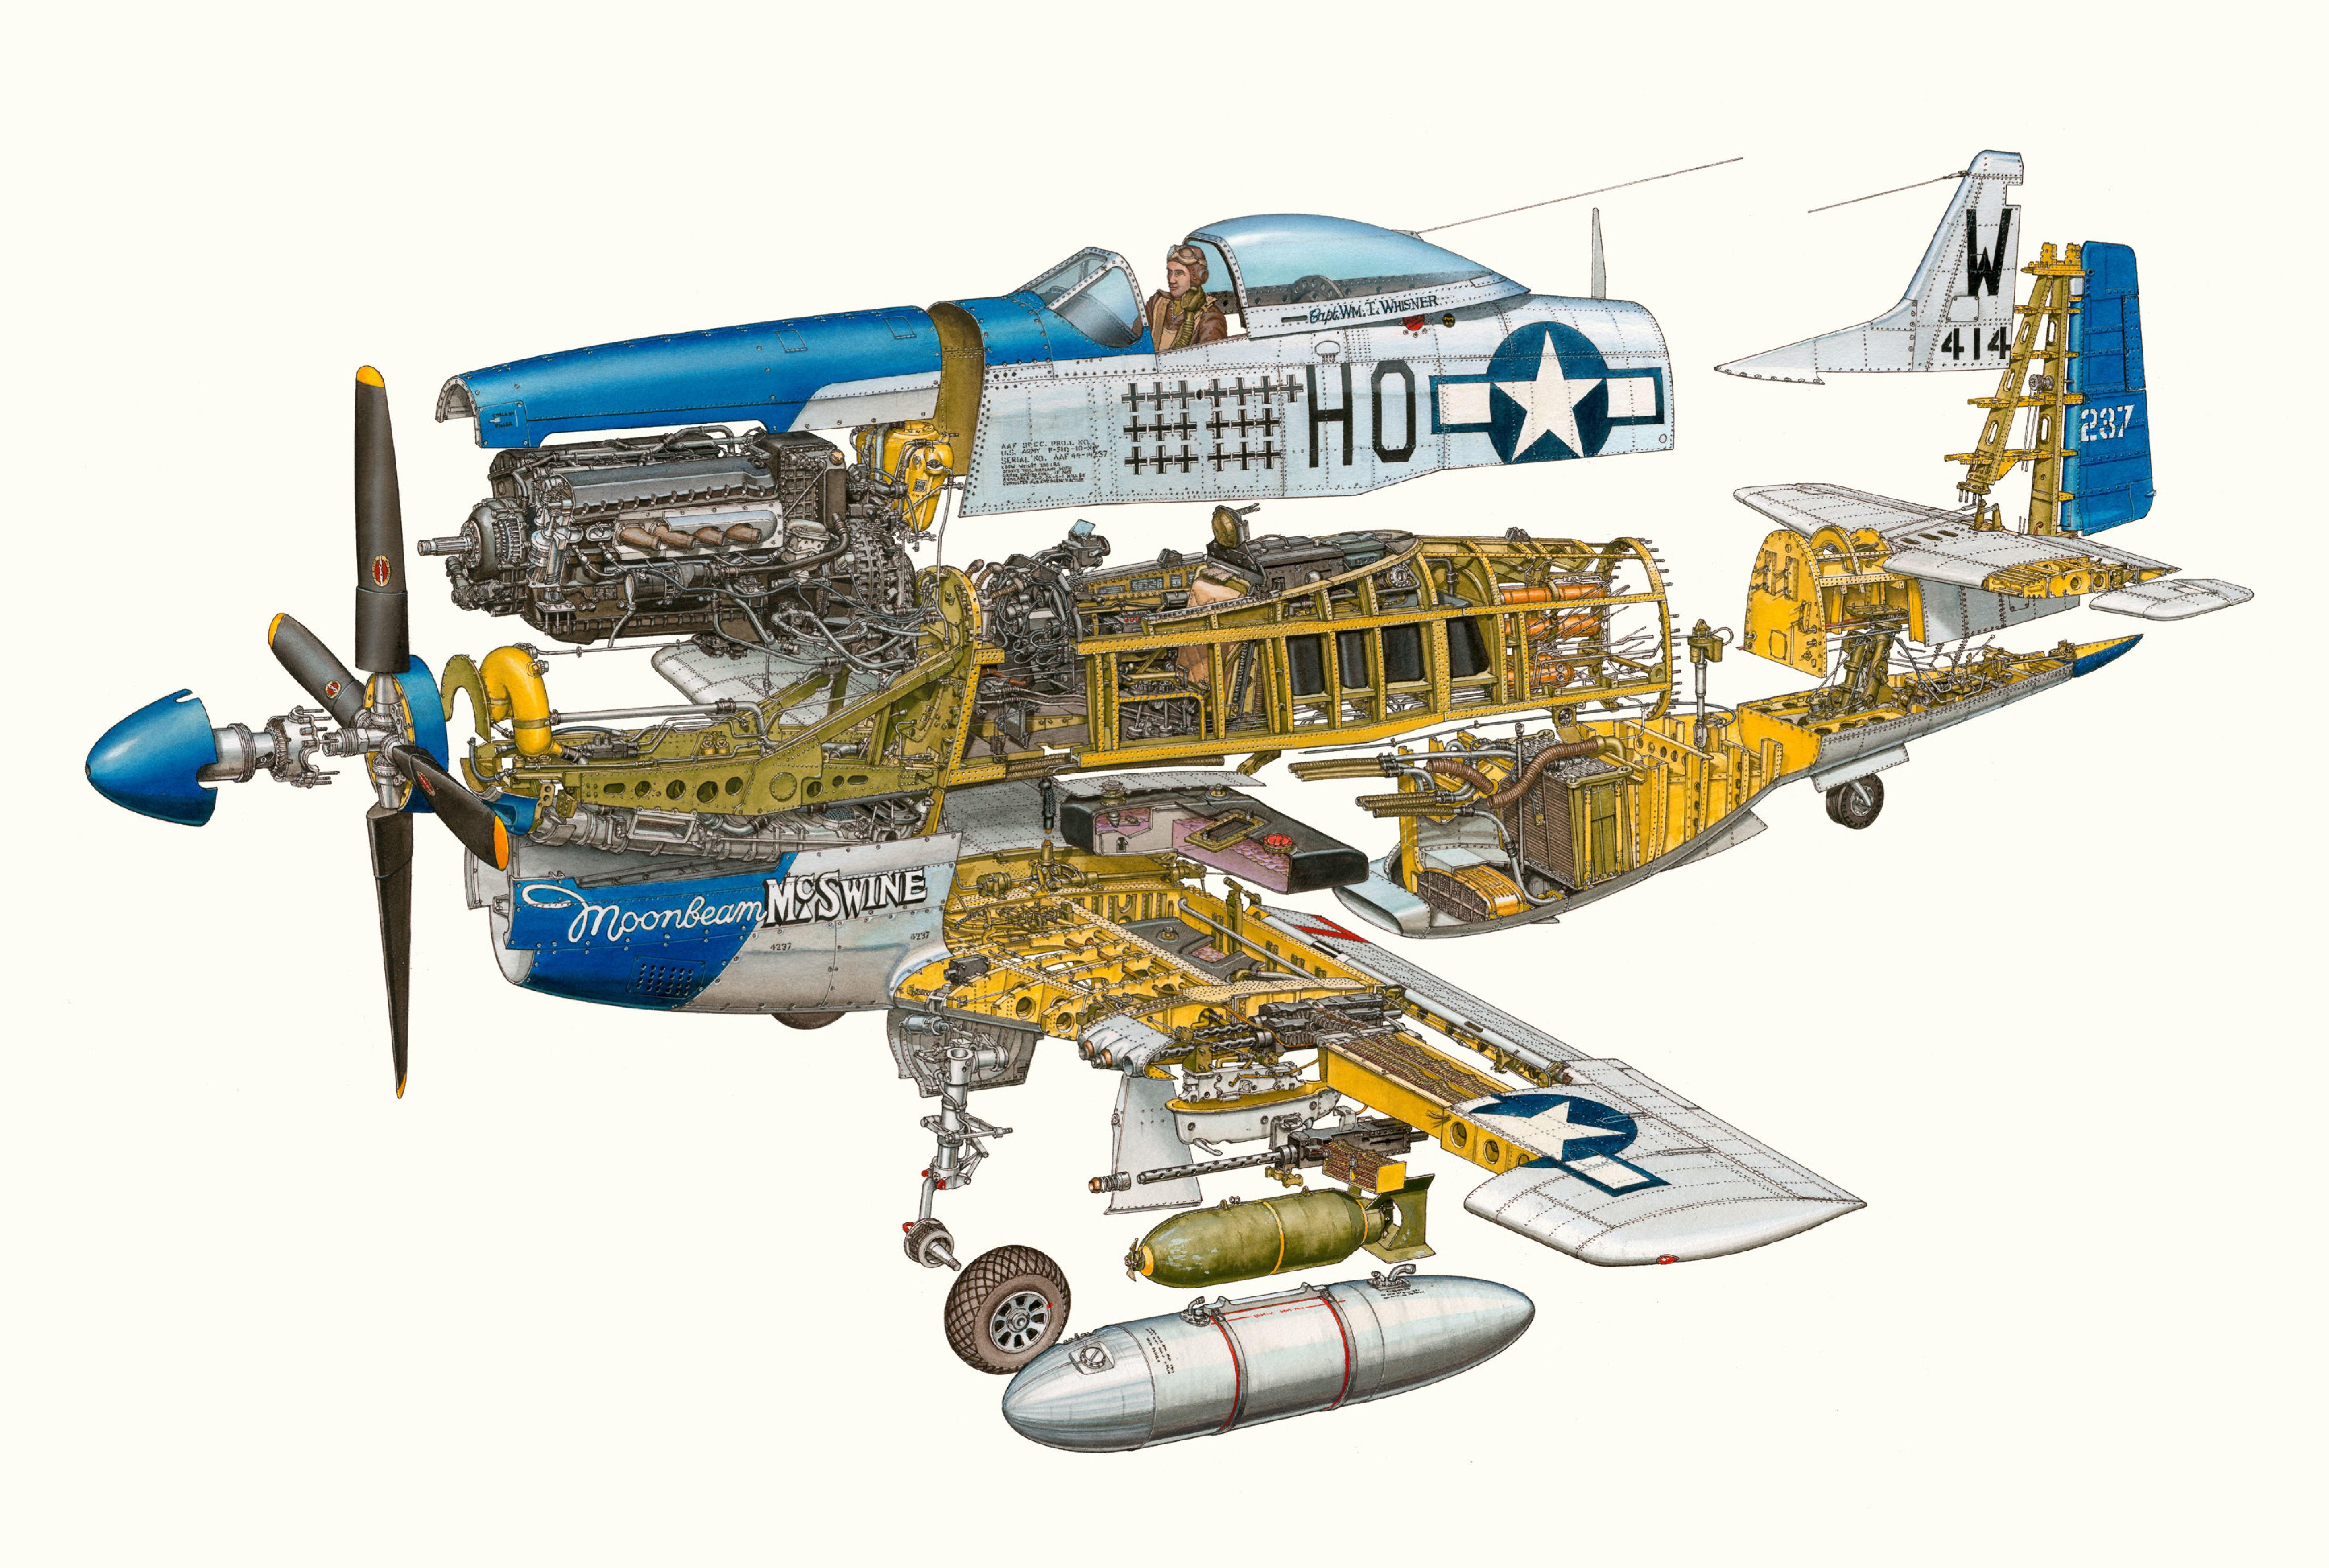 P-51 Mustang cutaway